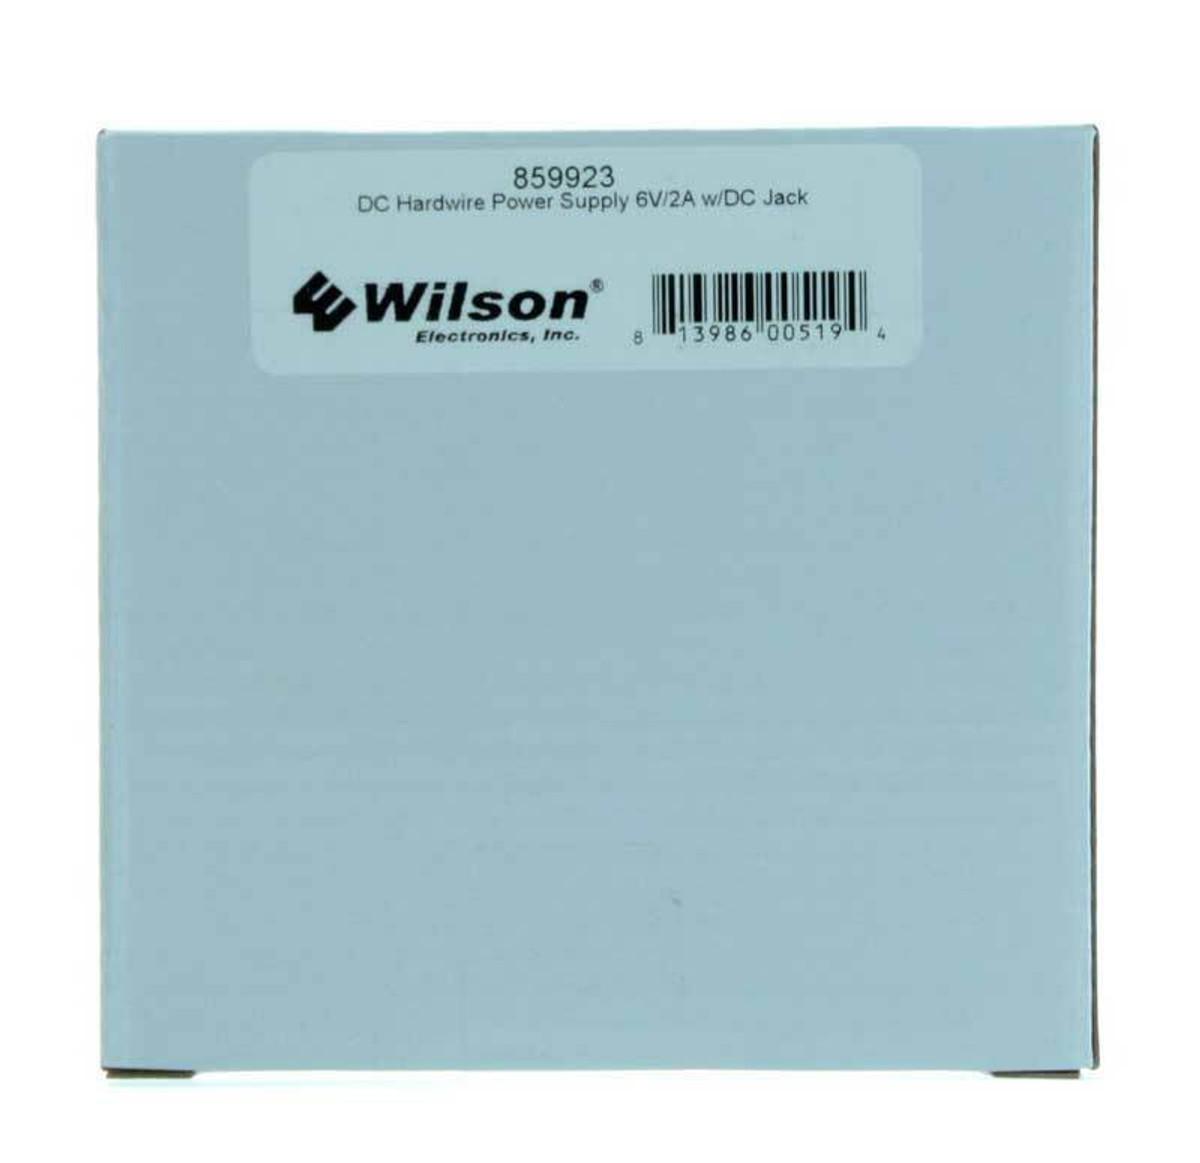 Wilson Electronics weBoost Wilson 859923 6V DC Vehicle Hardwire Power Supply